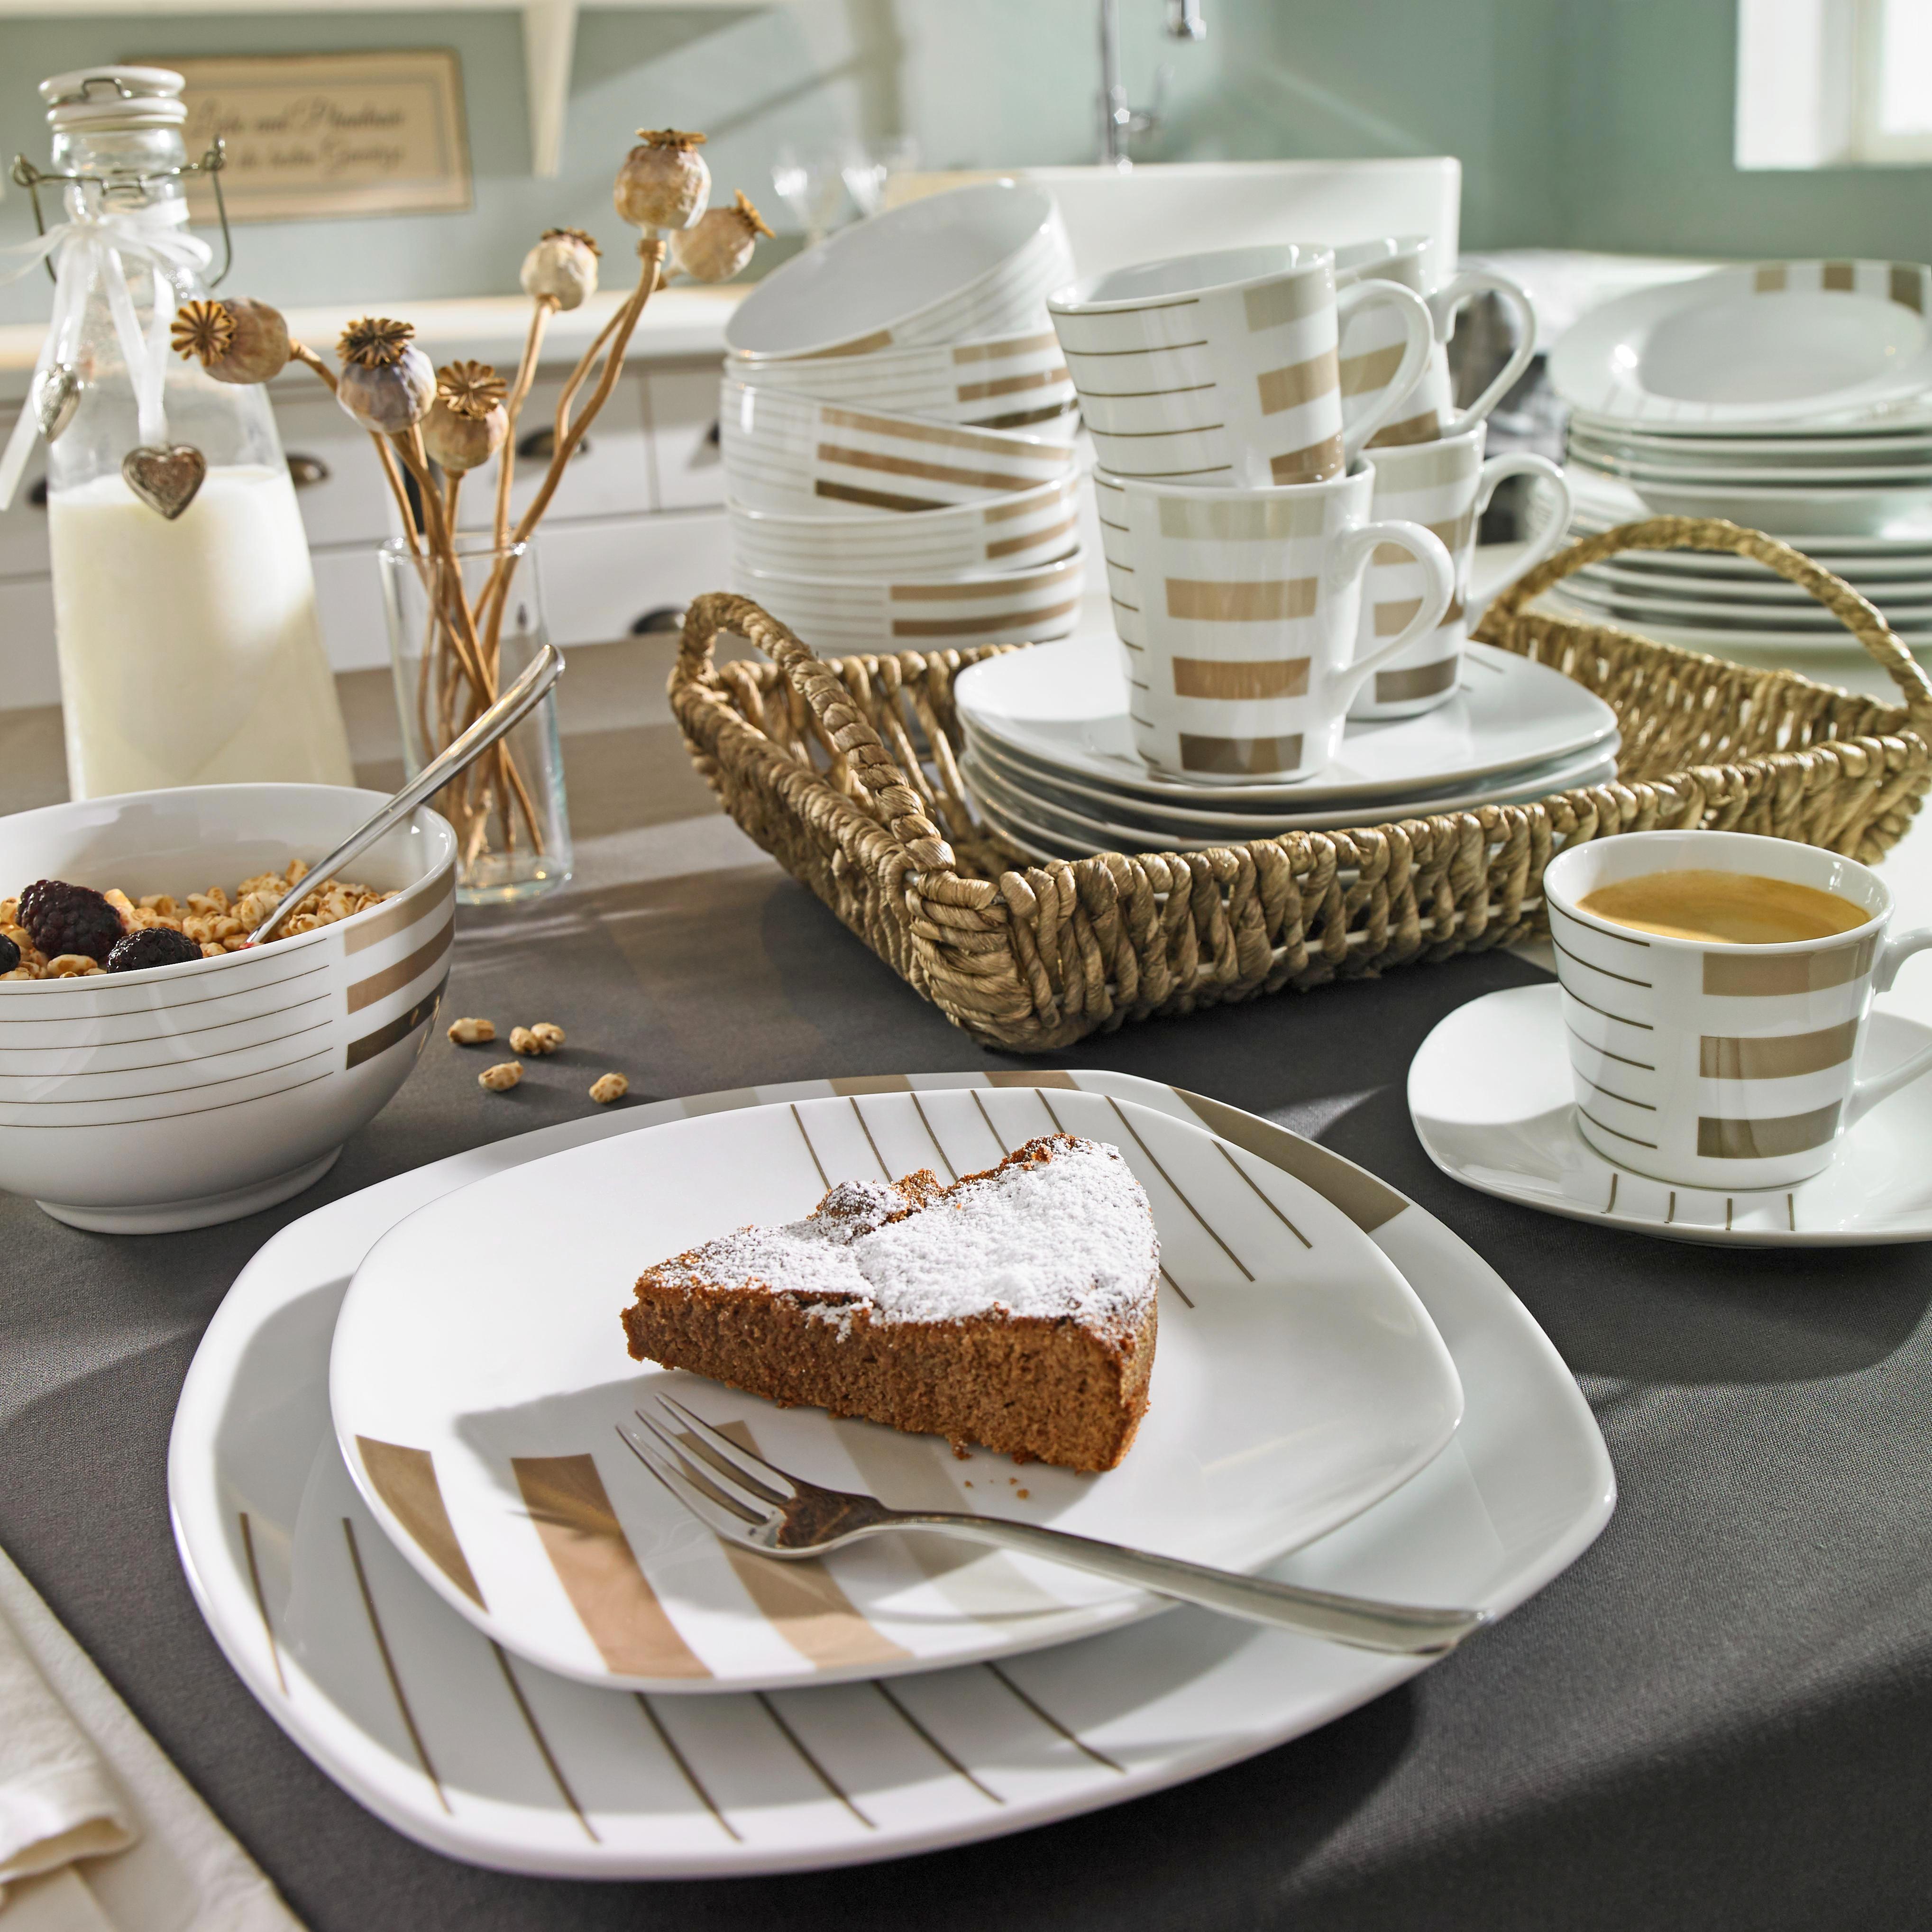 KOMPLETT SERVIS - vit/brun, Basics, keramik (//null) - Ritzenhoff Breker